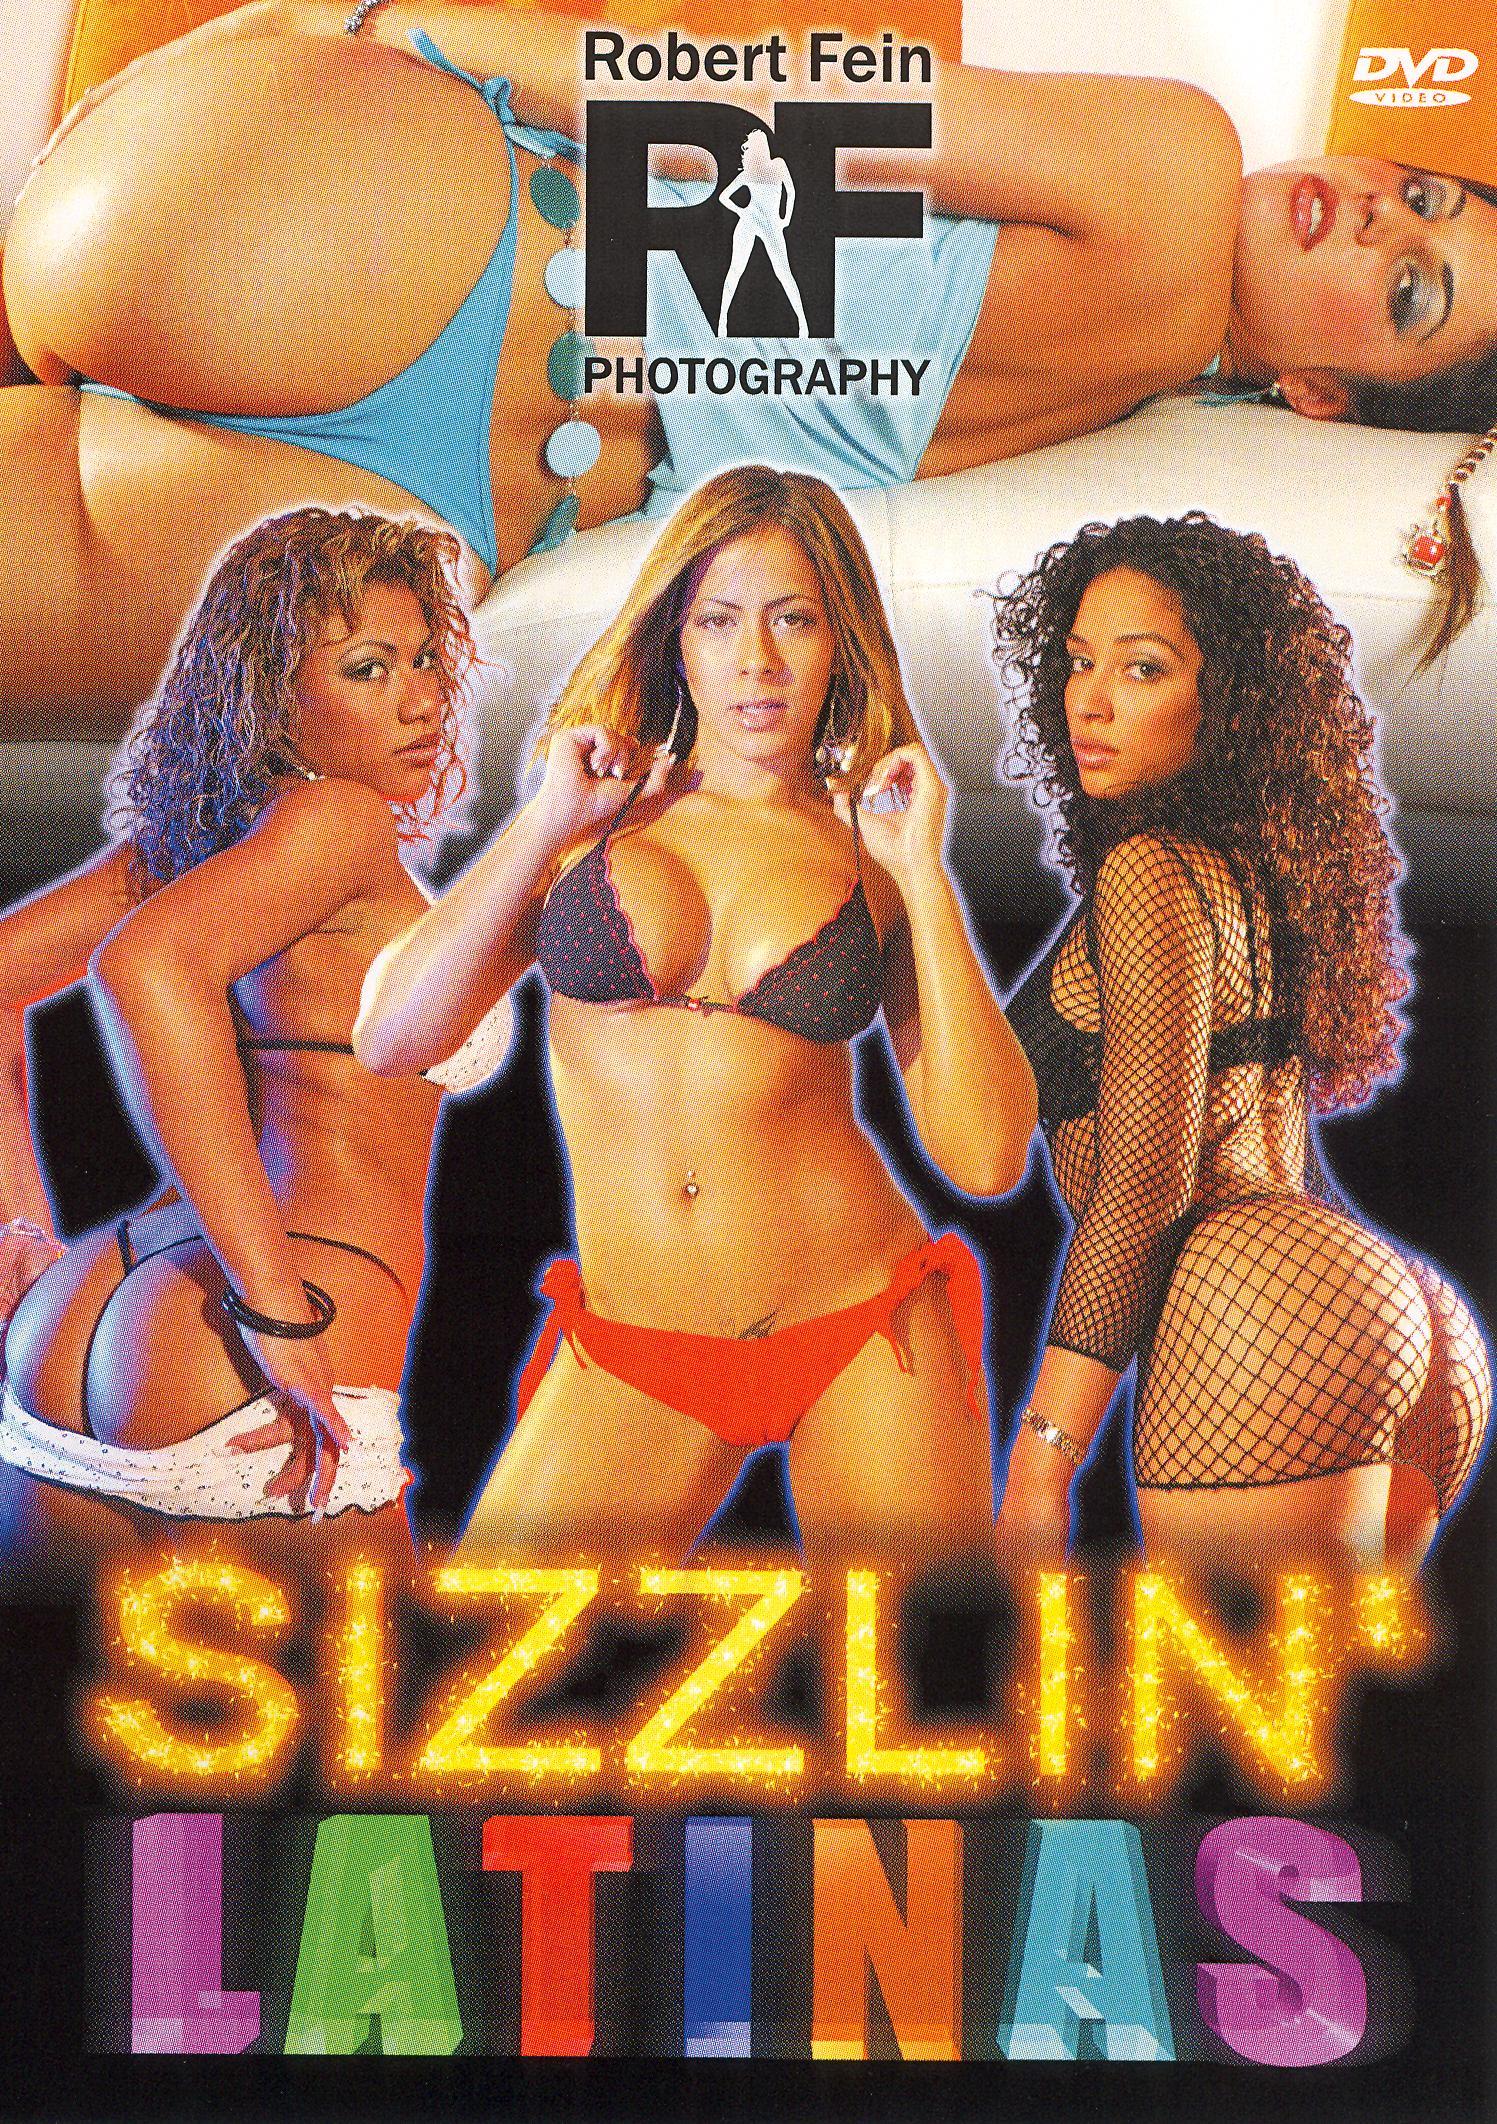 Sizzlin' Latinas